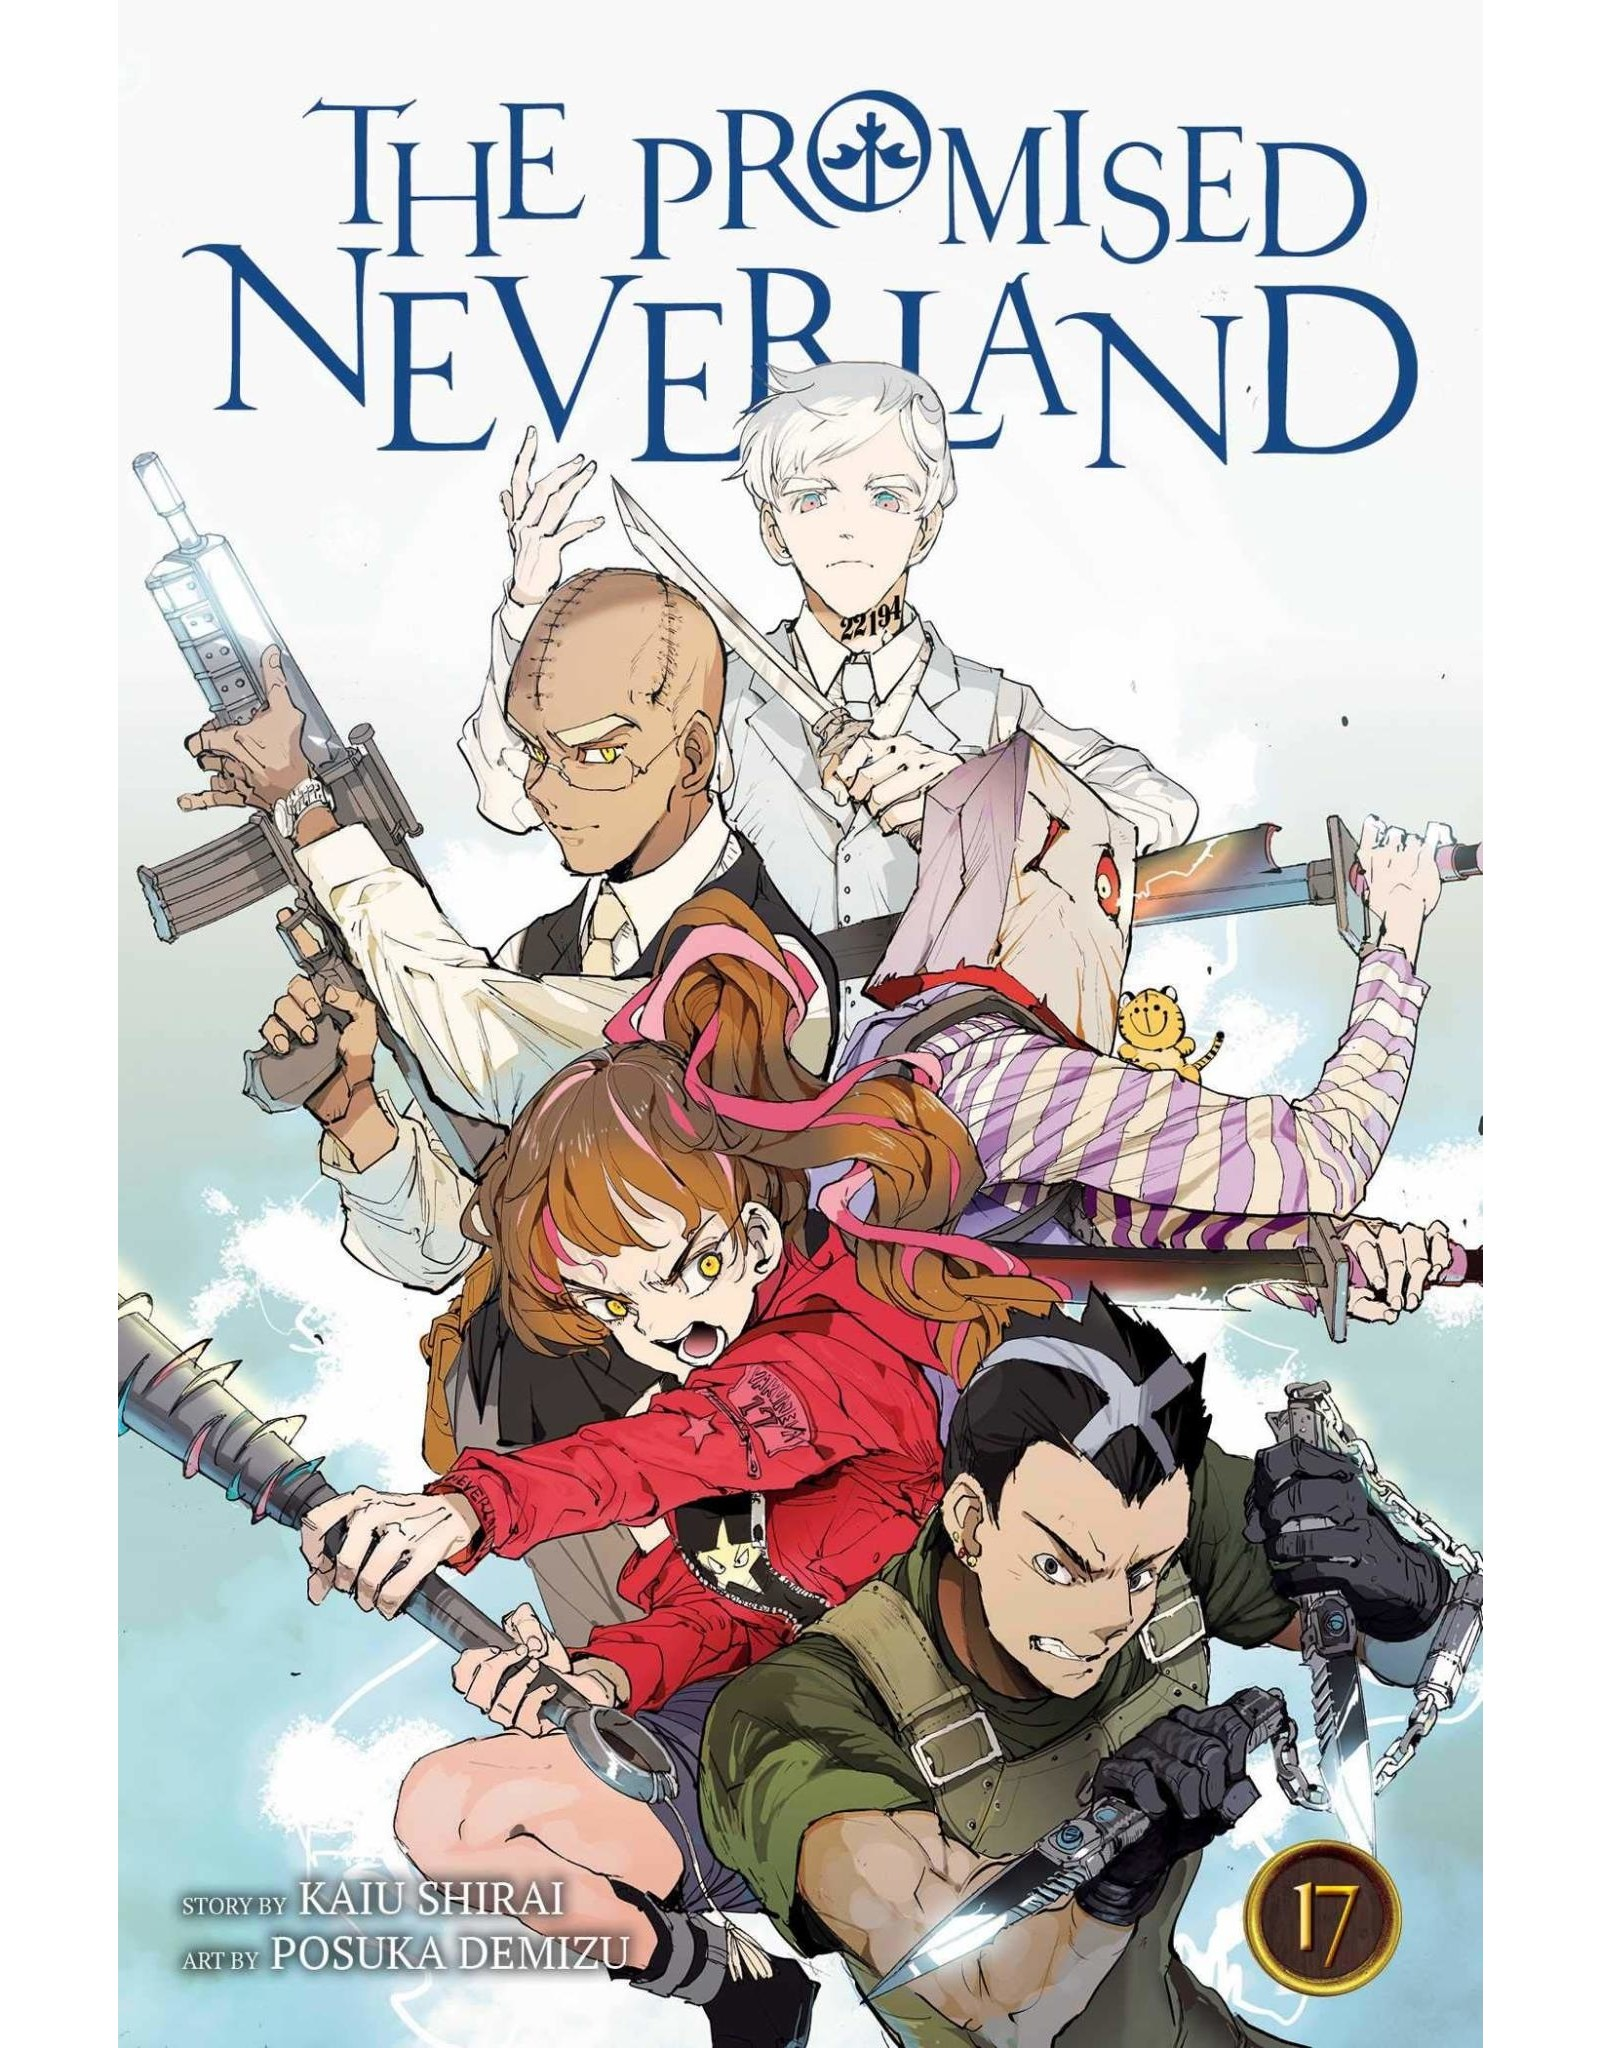 The Promised Neverland 17 (English)